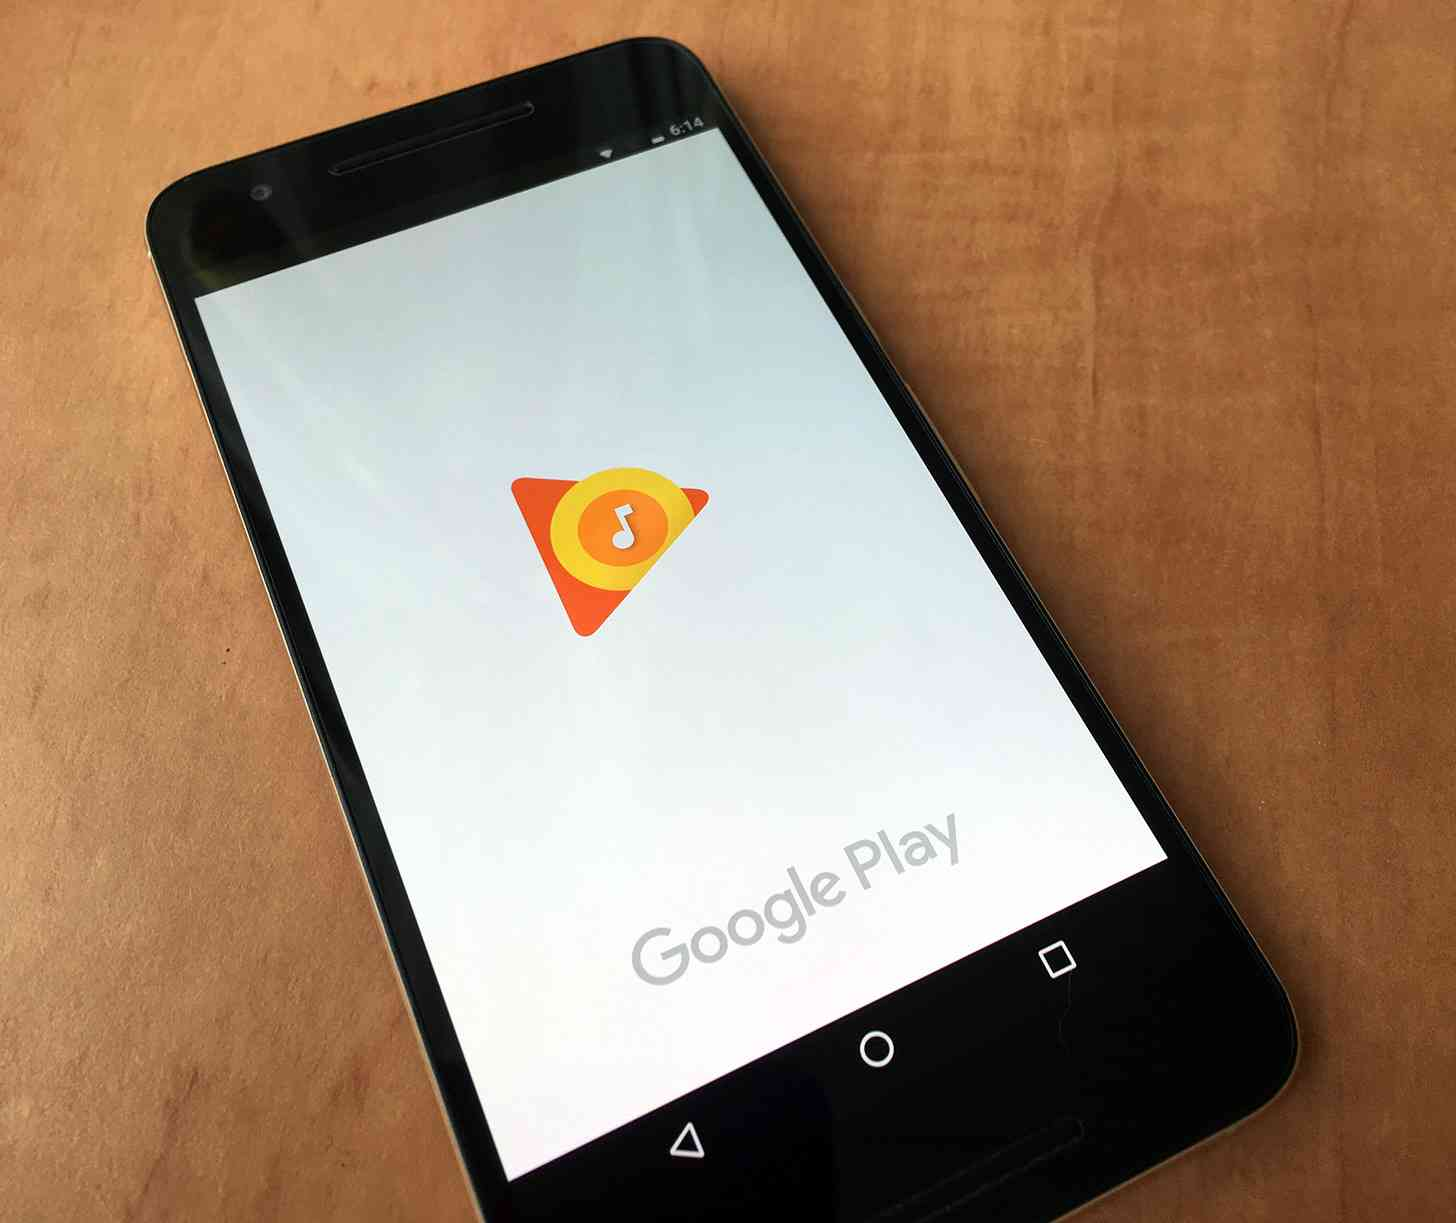 Google Play Music Android app splash screen